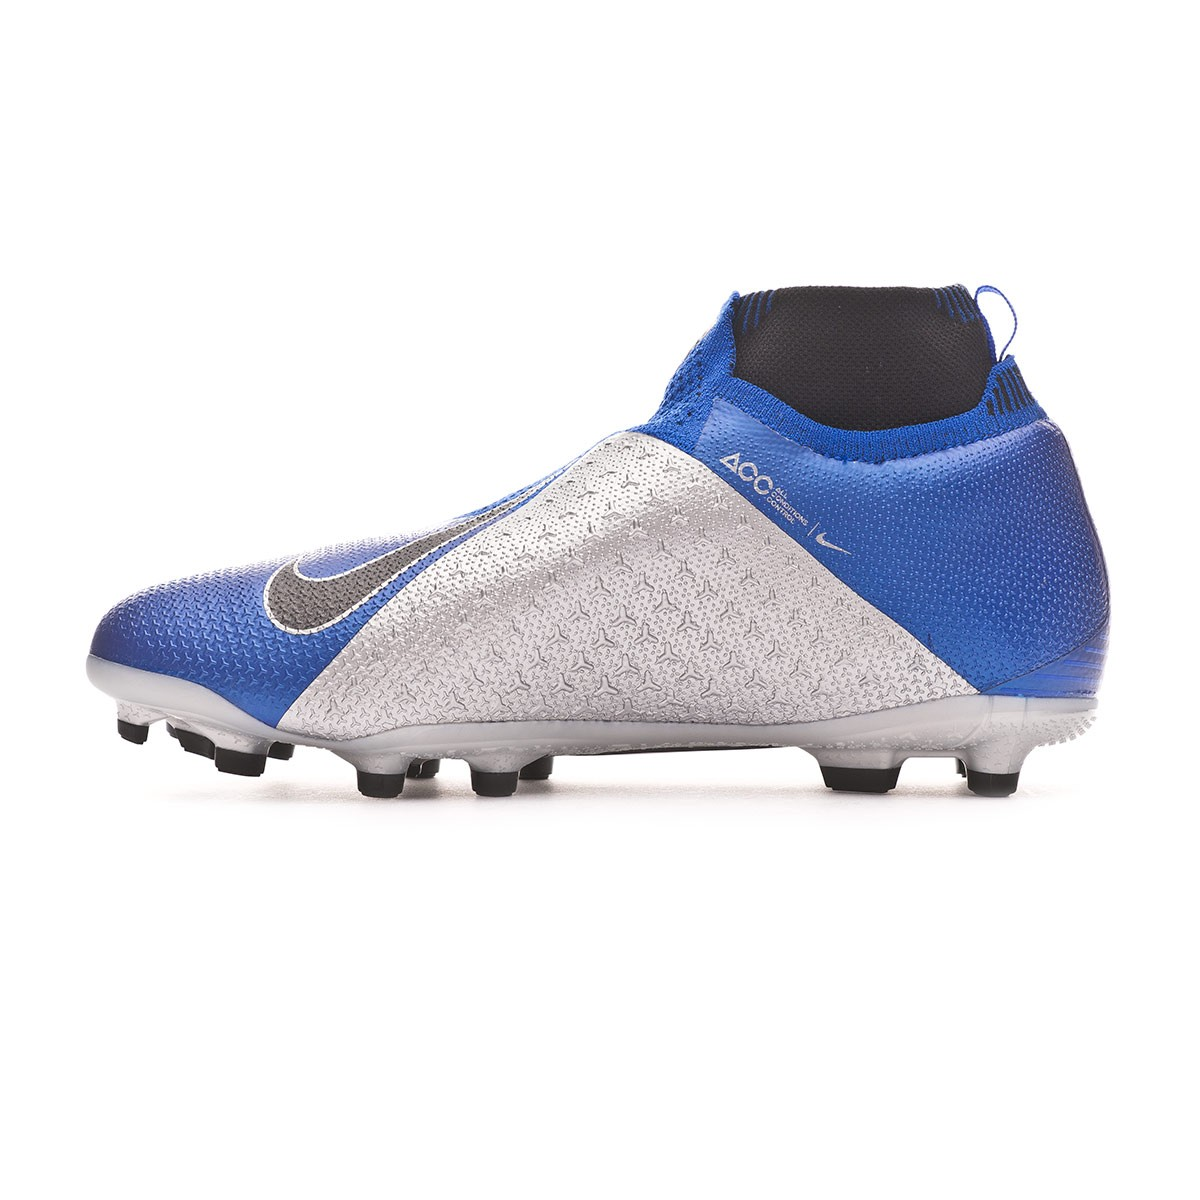 5f3f2a515 Football Boots Nike Kids Phantom Vision Elite DF FG/MG Racer blue-Black-Metallic  silver-Volt - Tienda de fútbol Fútbol Emotion